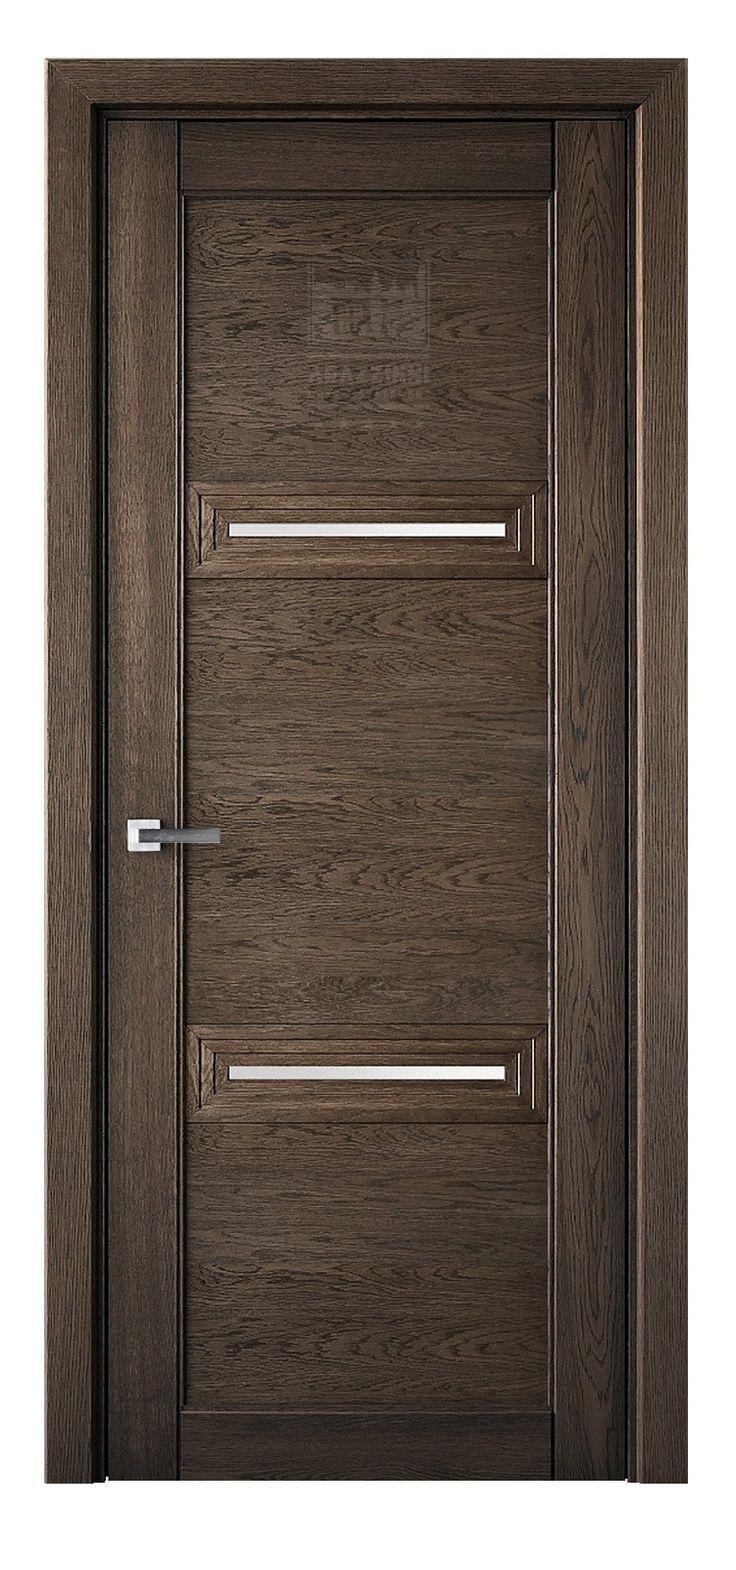 10 Best Gray Oak Massello Di Rovere Images On Pinterest Red Oak